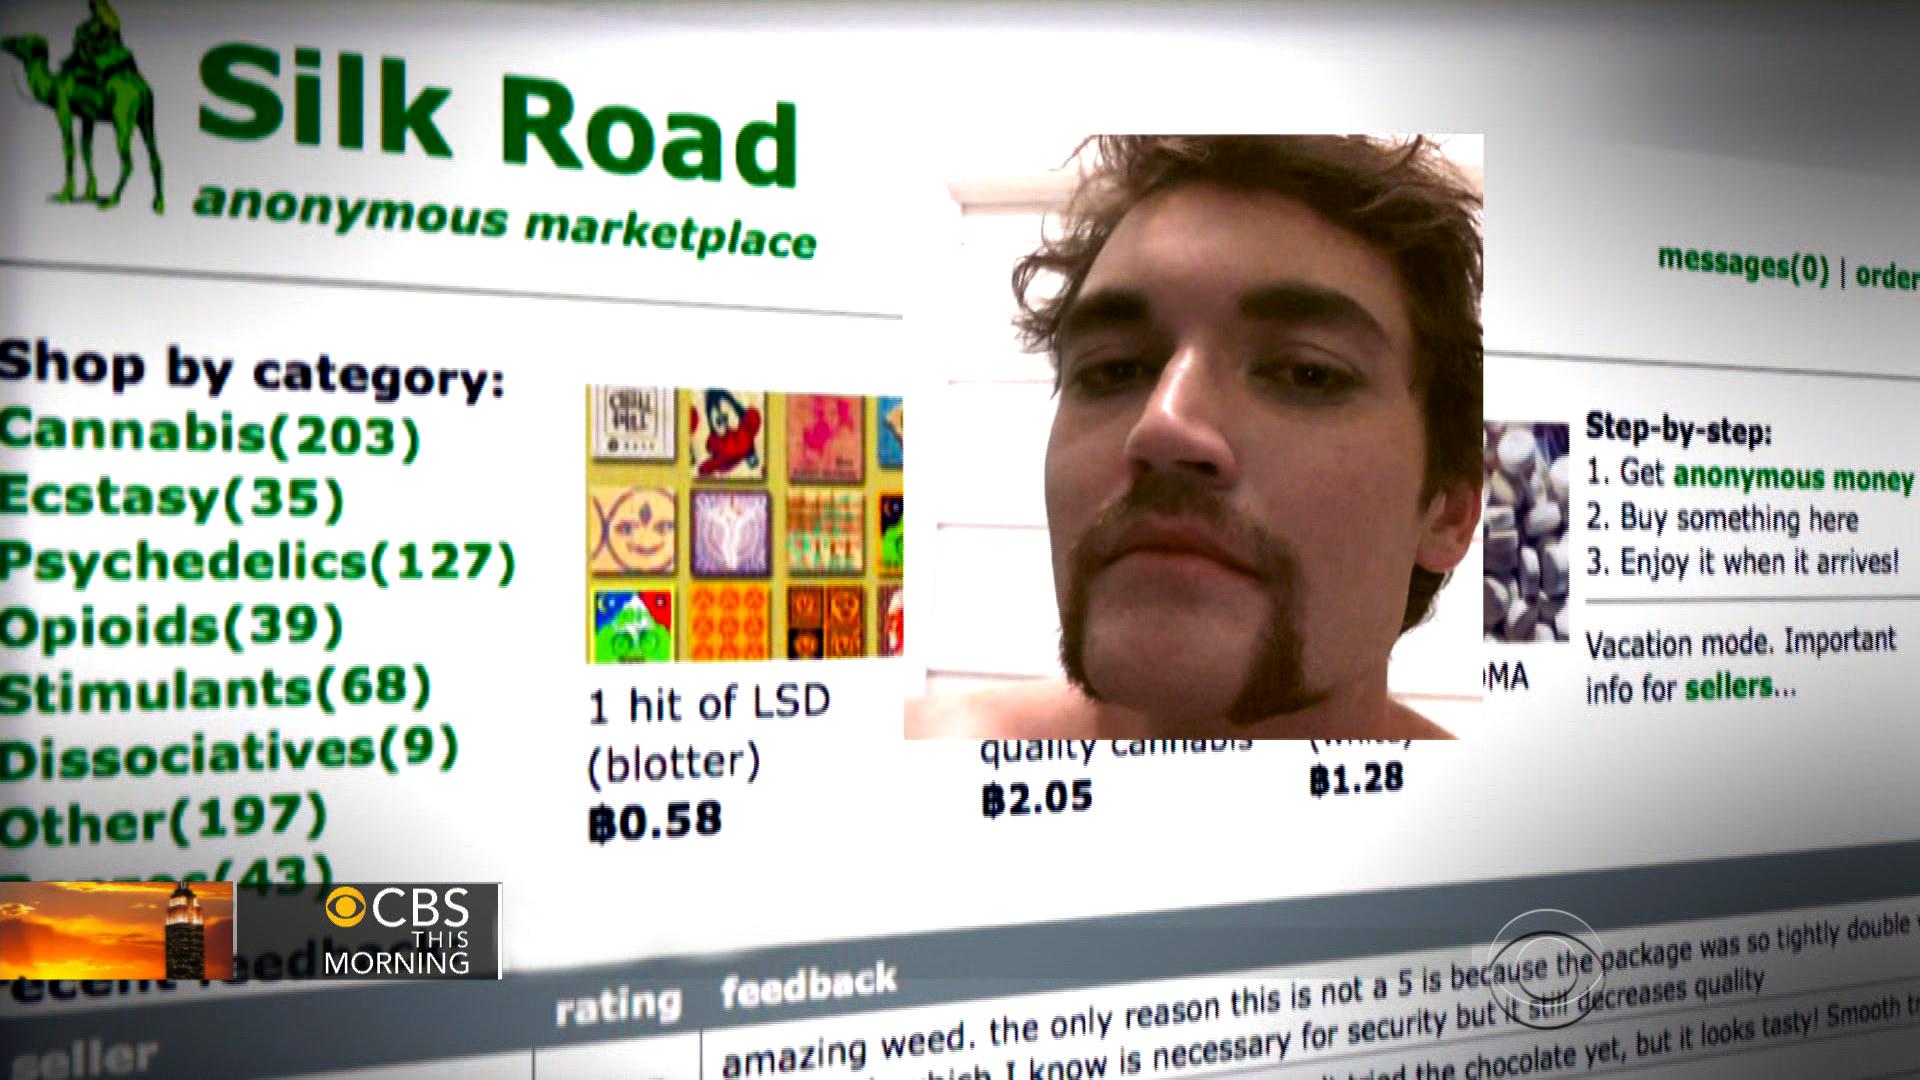 bitcoin black market silk road)